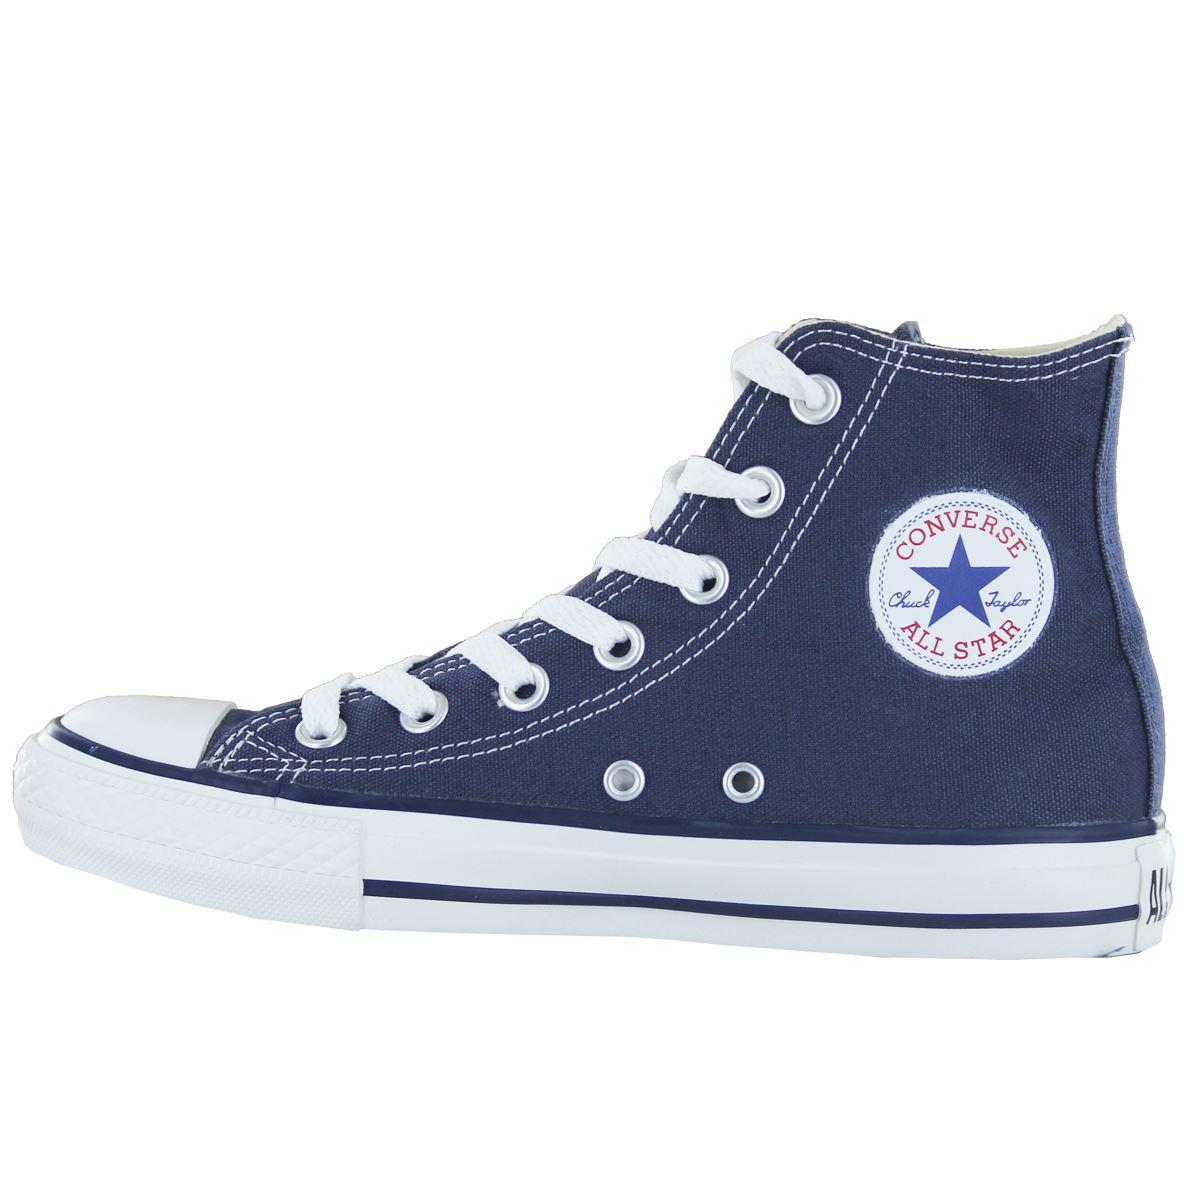 Converse-Chuck-Taylor-All-Star-Hi-Canvas-Mens-Womens-Ladies-Unisex-Trainers miniatuur 13